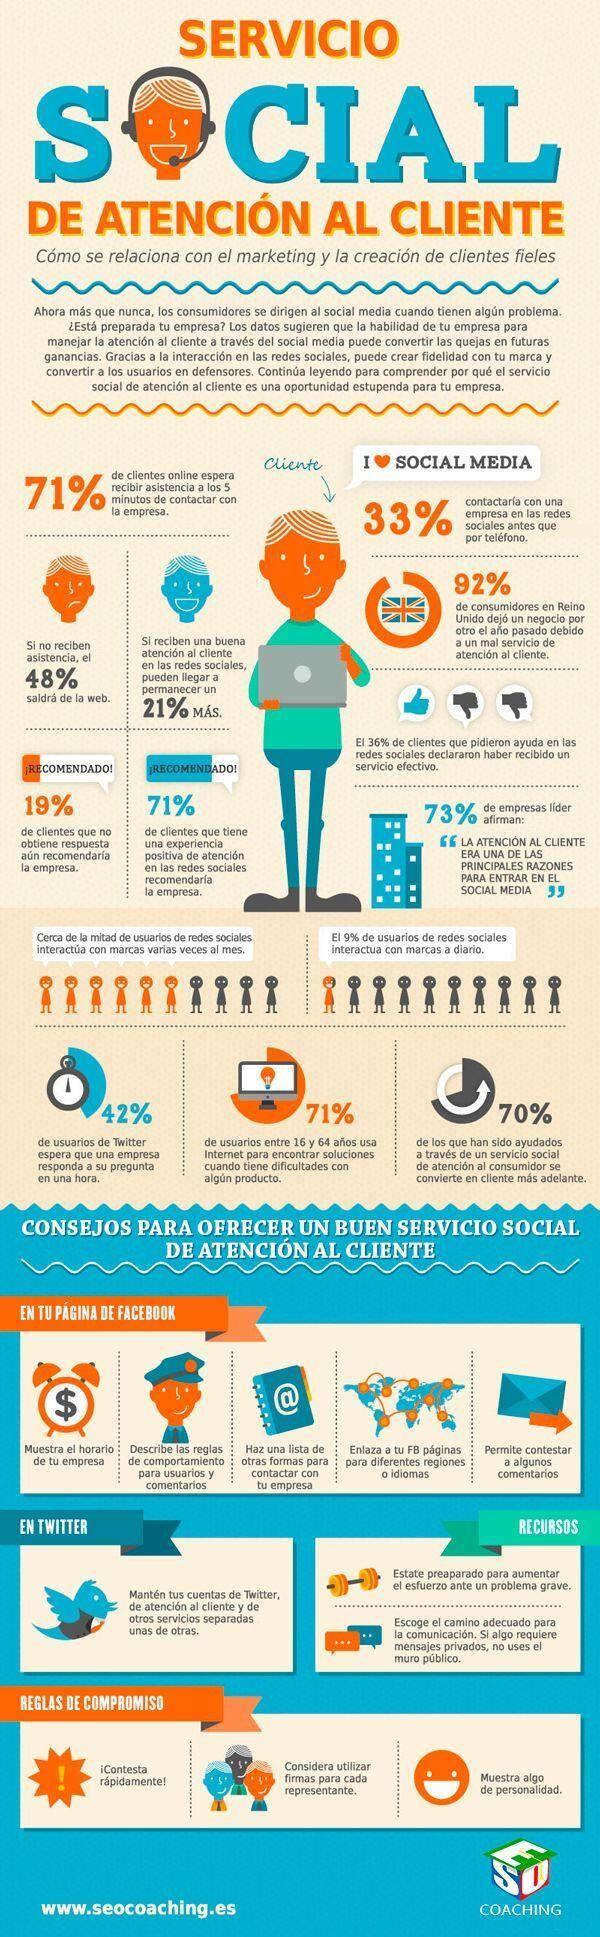 Atención al cliente con Redes Sociales #infografia #infographic #marketing #socialmedia